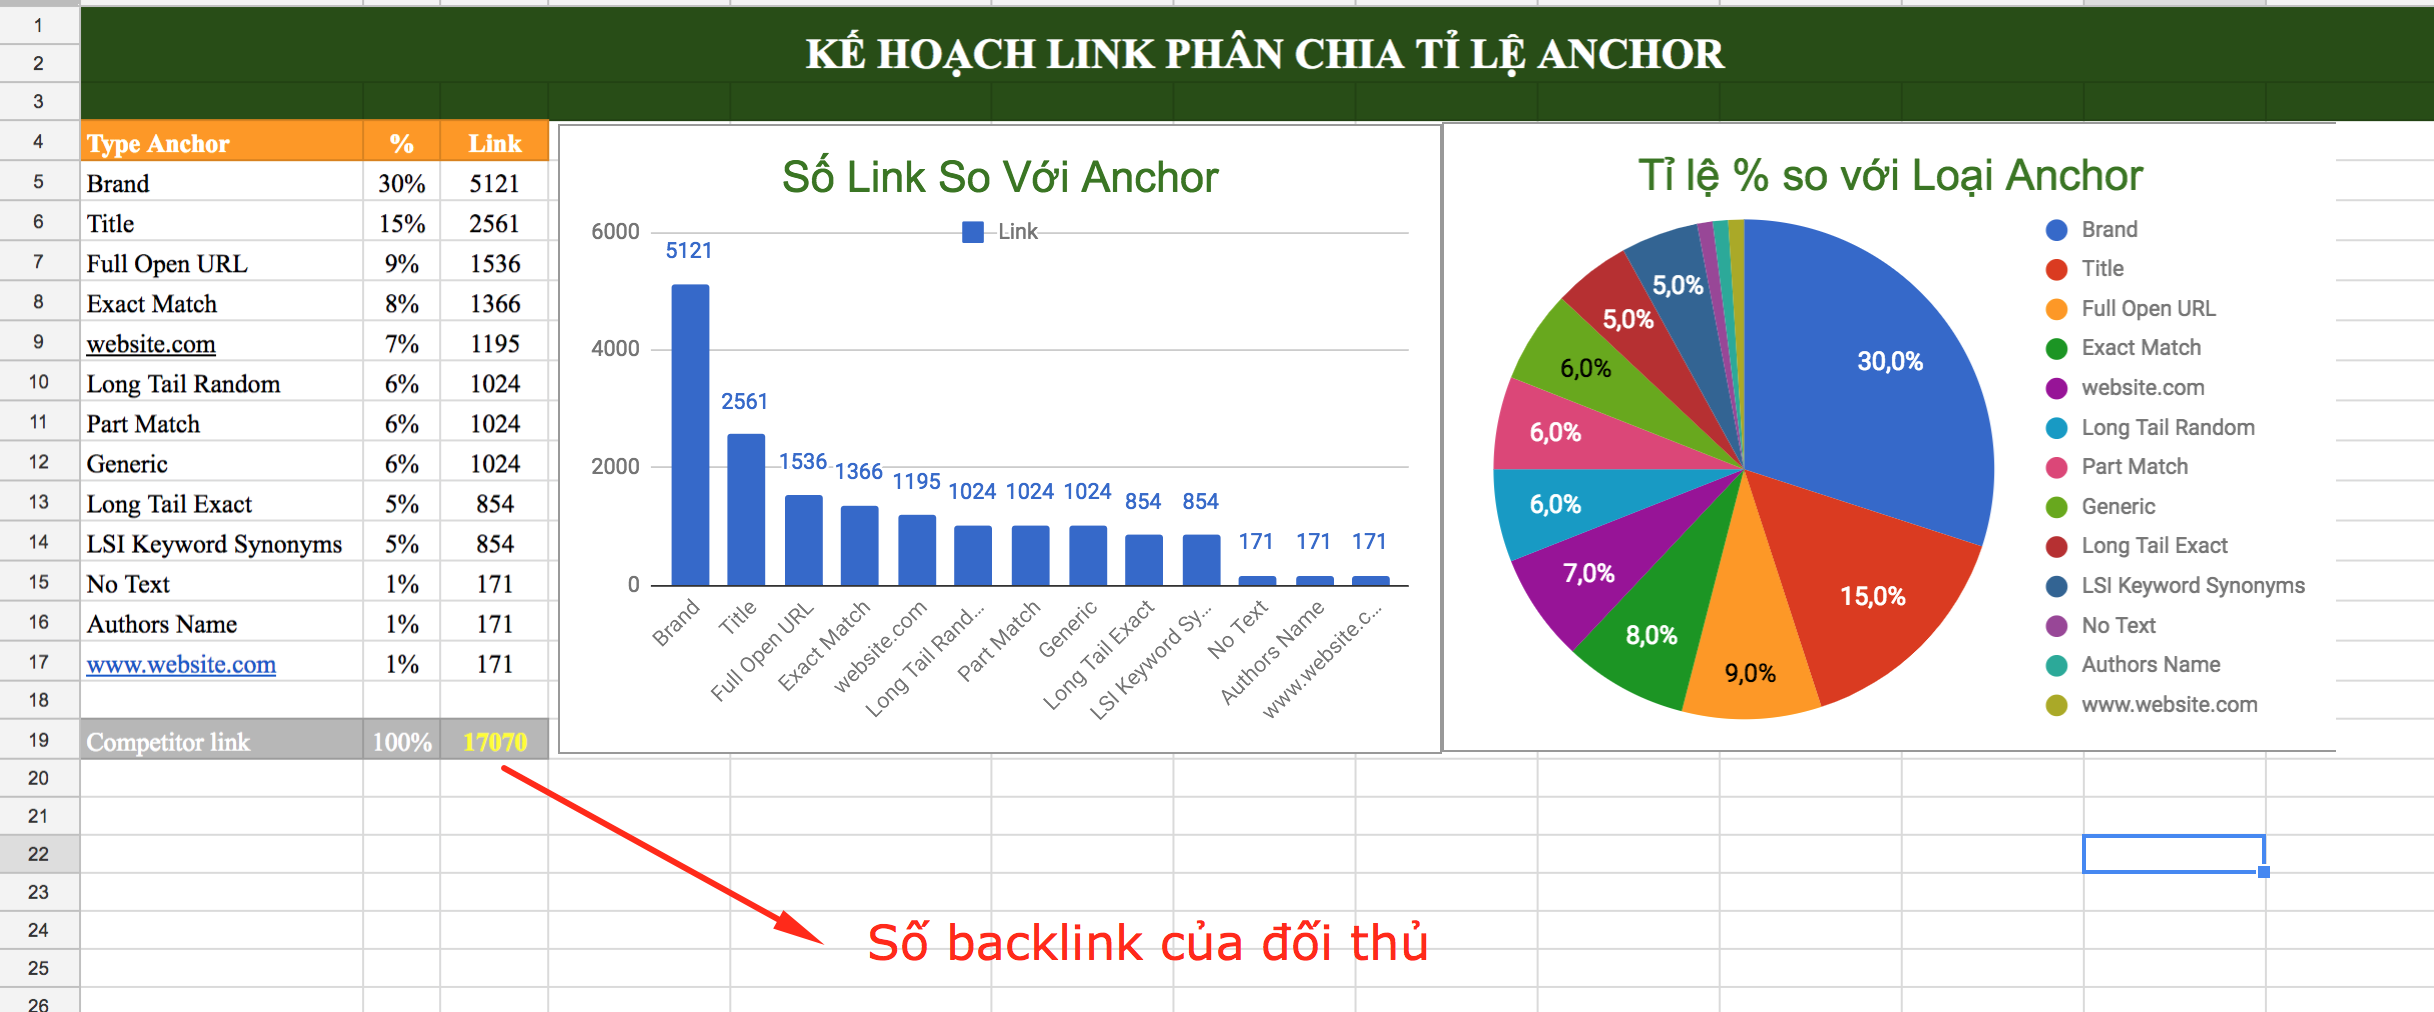 ke-hoach-link-phan-bo-ti-le-anchor